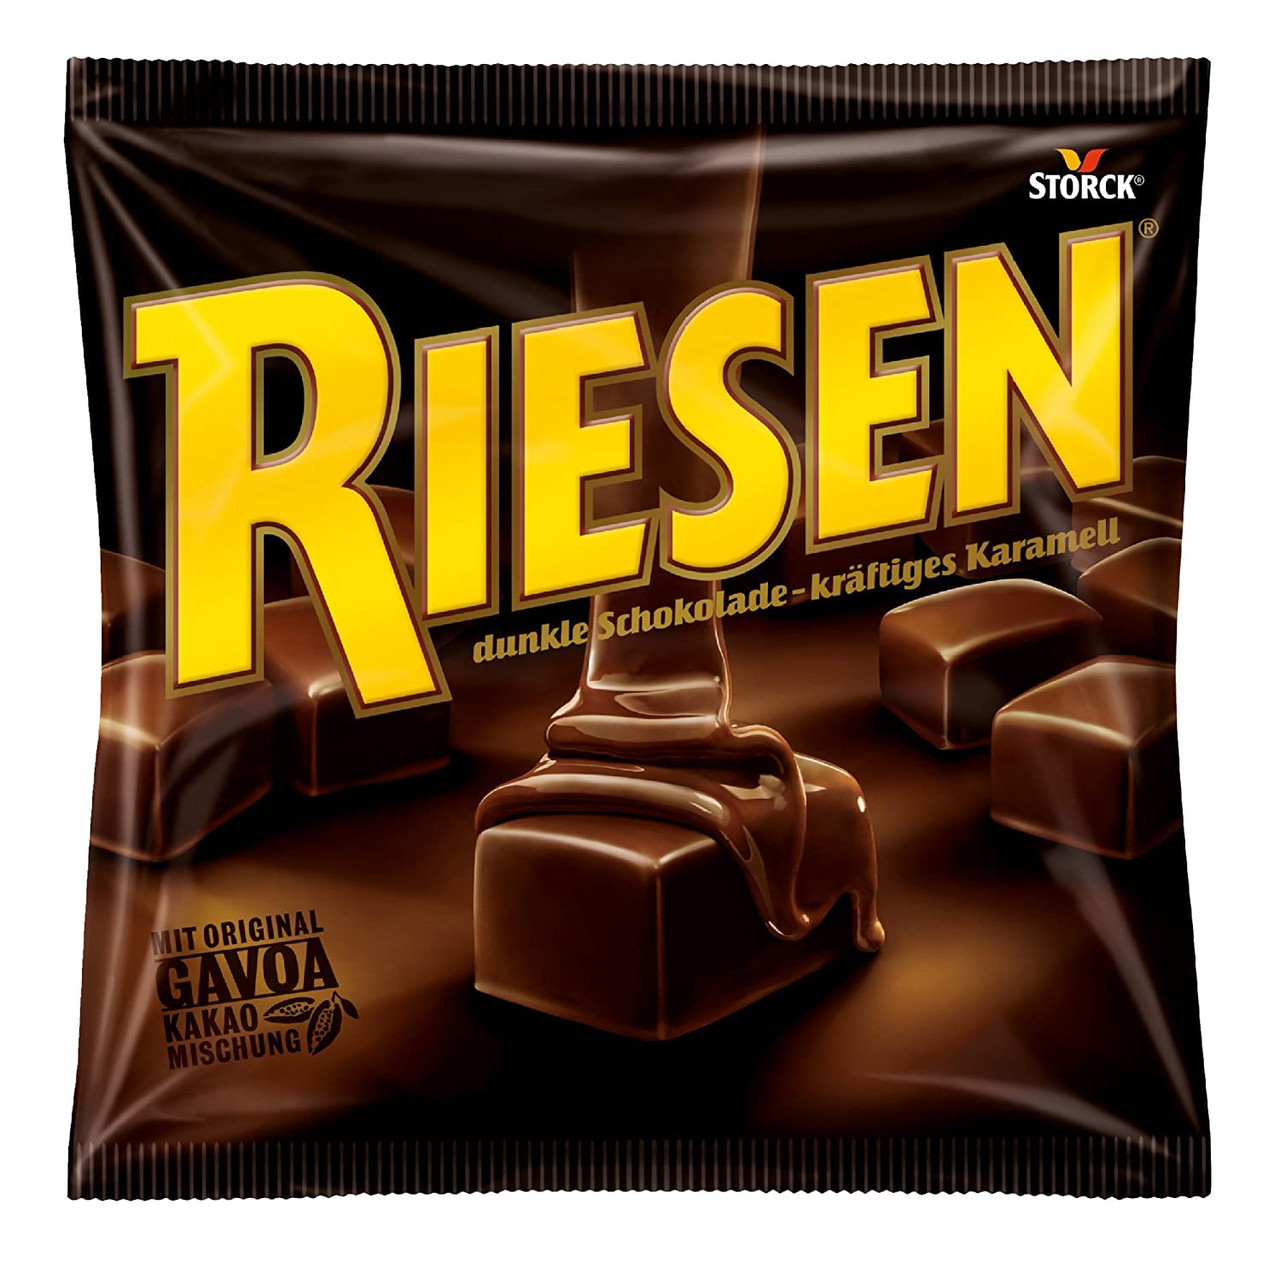 Storck Riesen Карамель в тёмном шоколаде